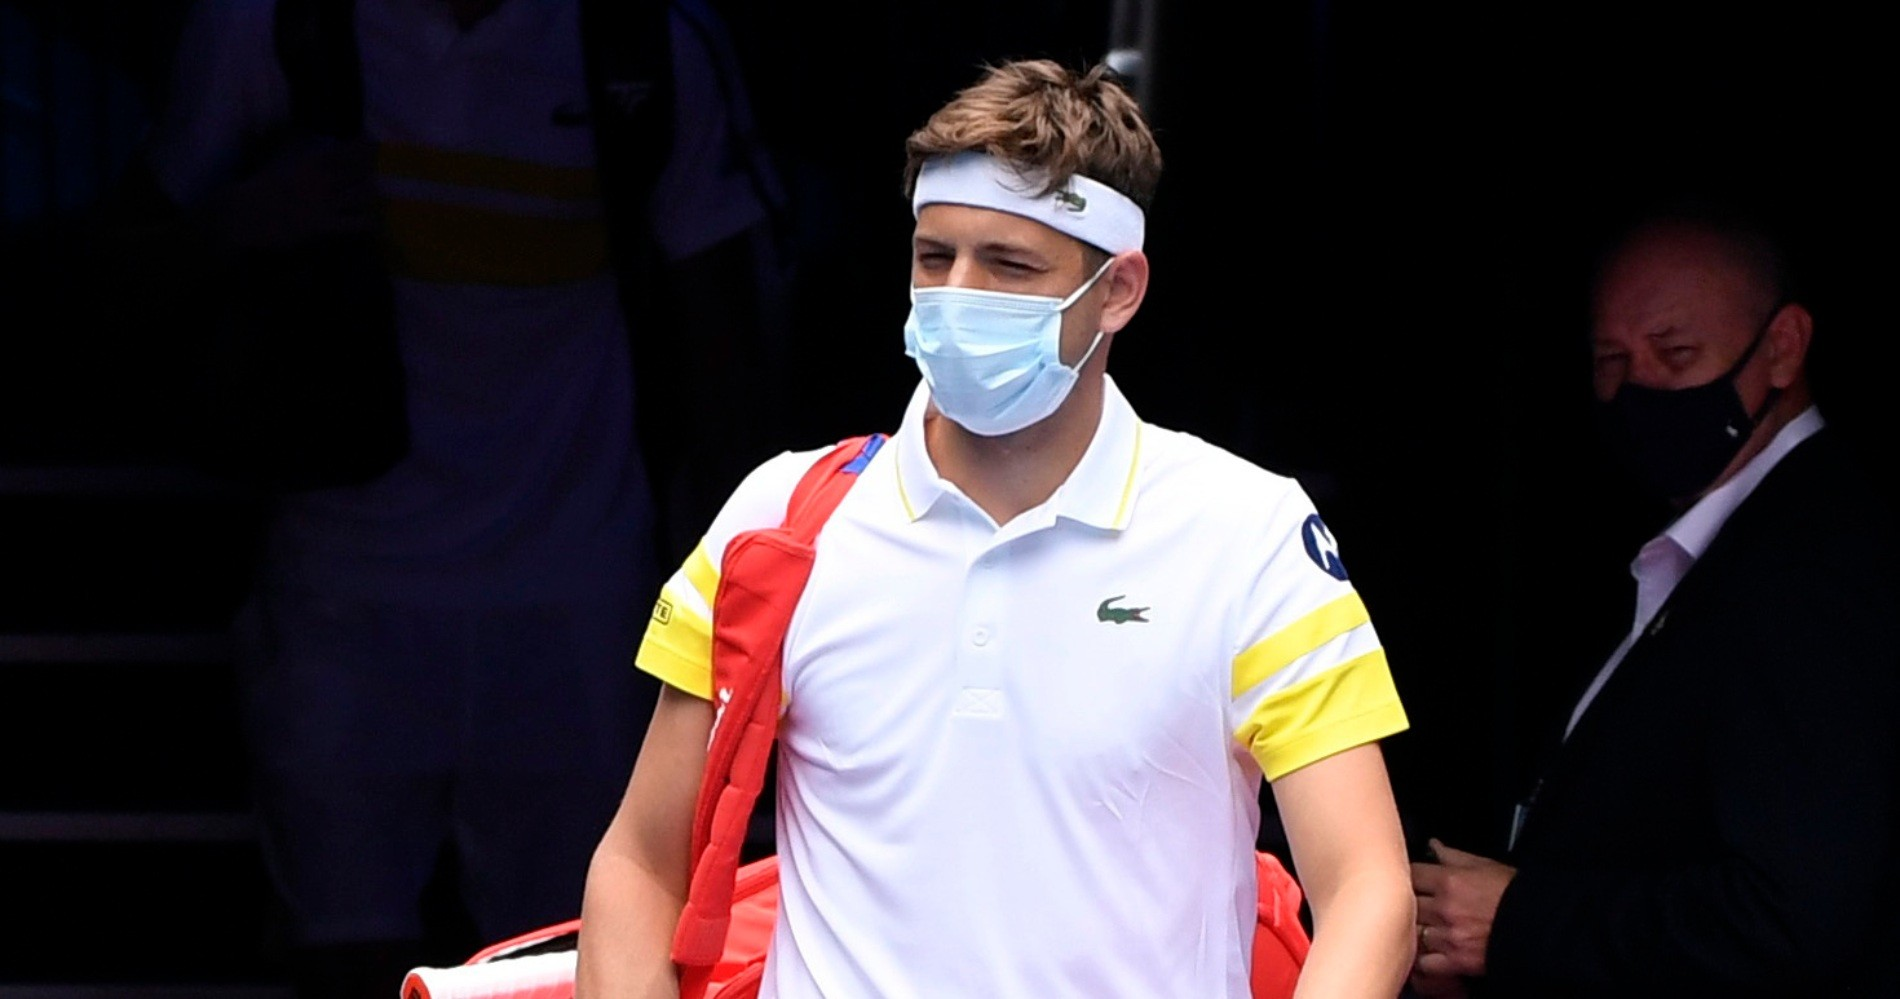 Filip Krajinovic, Australian Open, 2021